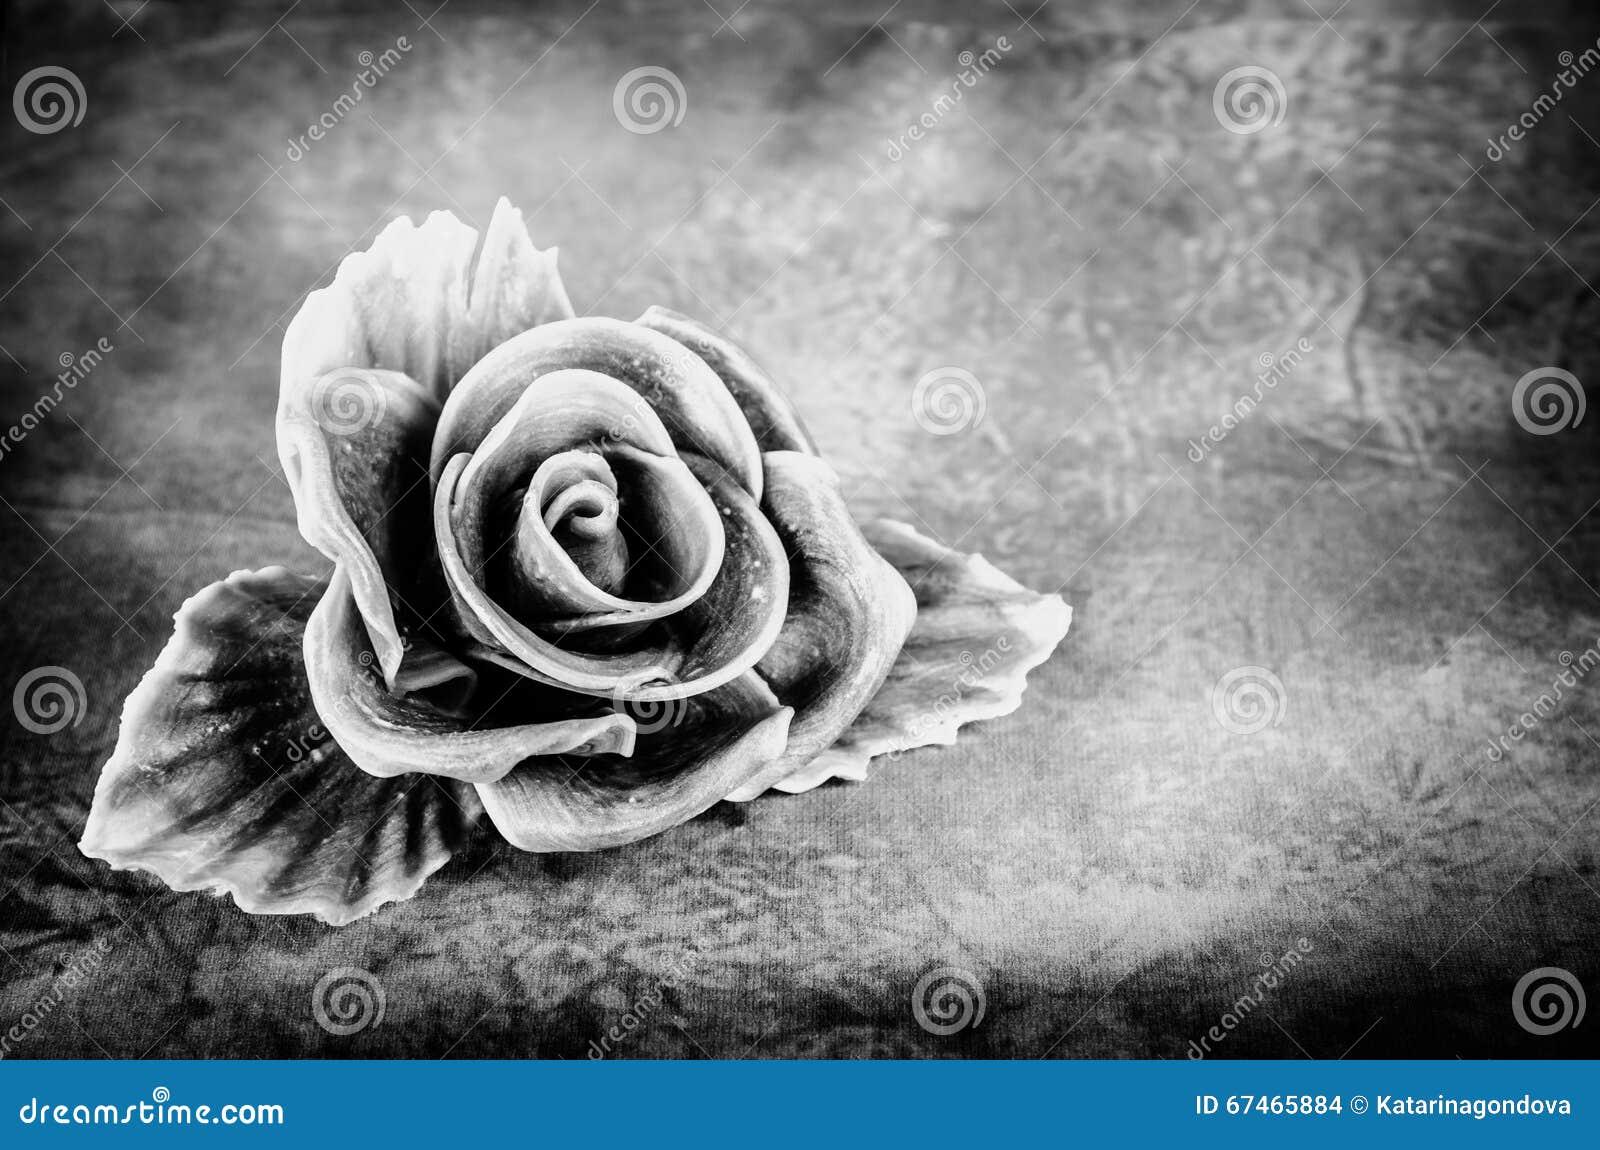 fleur rose triste photo stock - image: 67465884